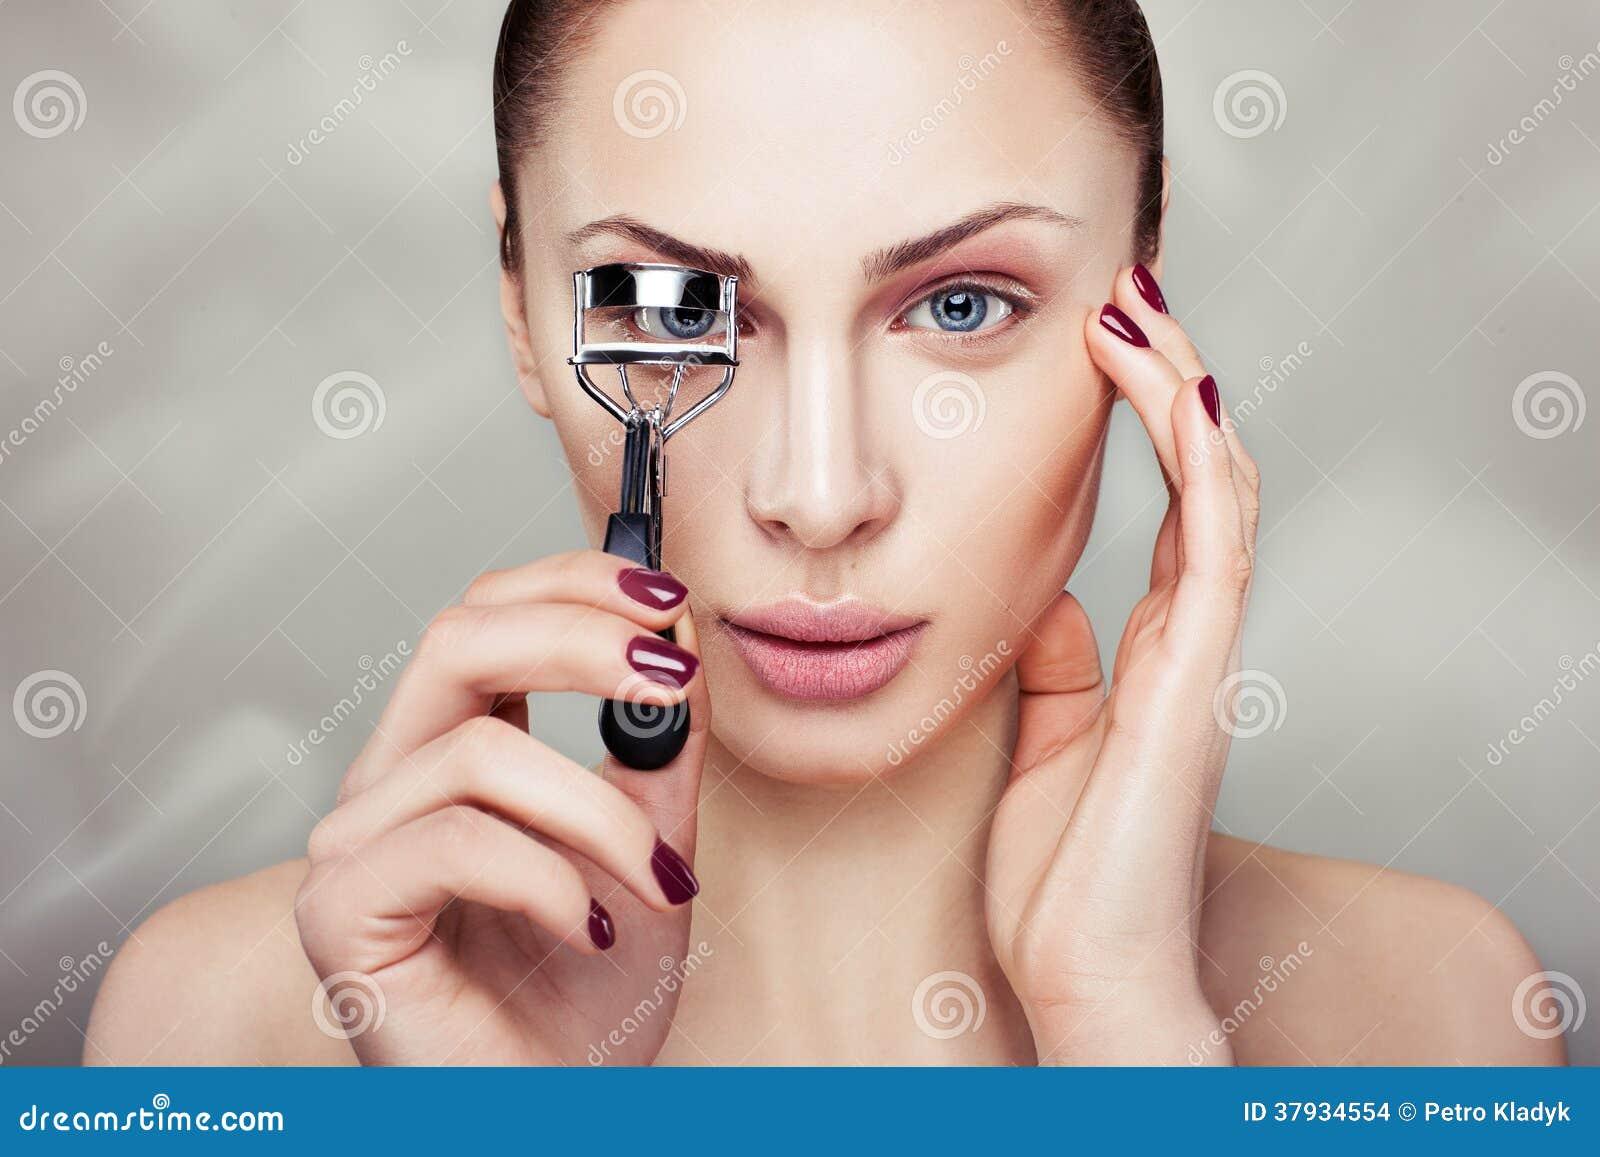 Girl With Curling Eyelashes Stock Photo Image Of Caucasian